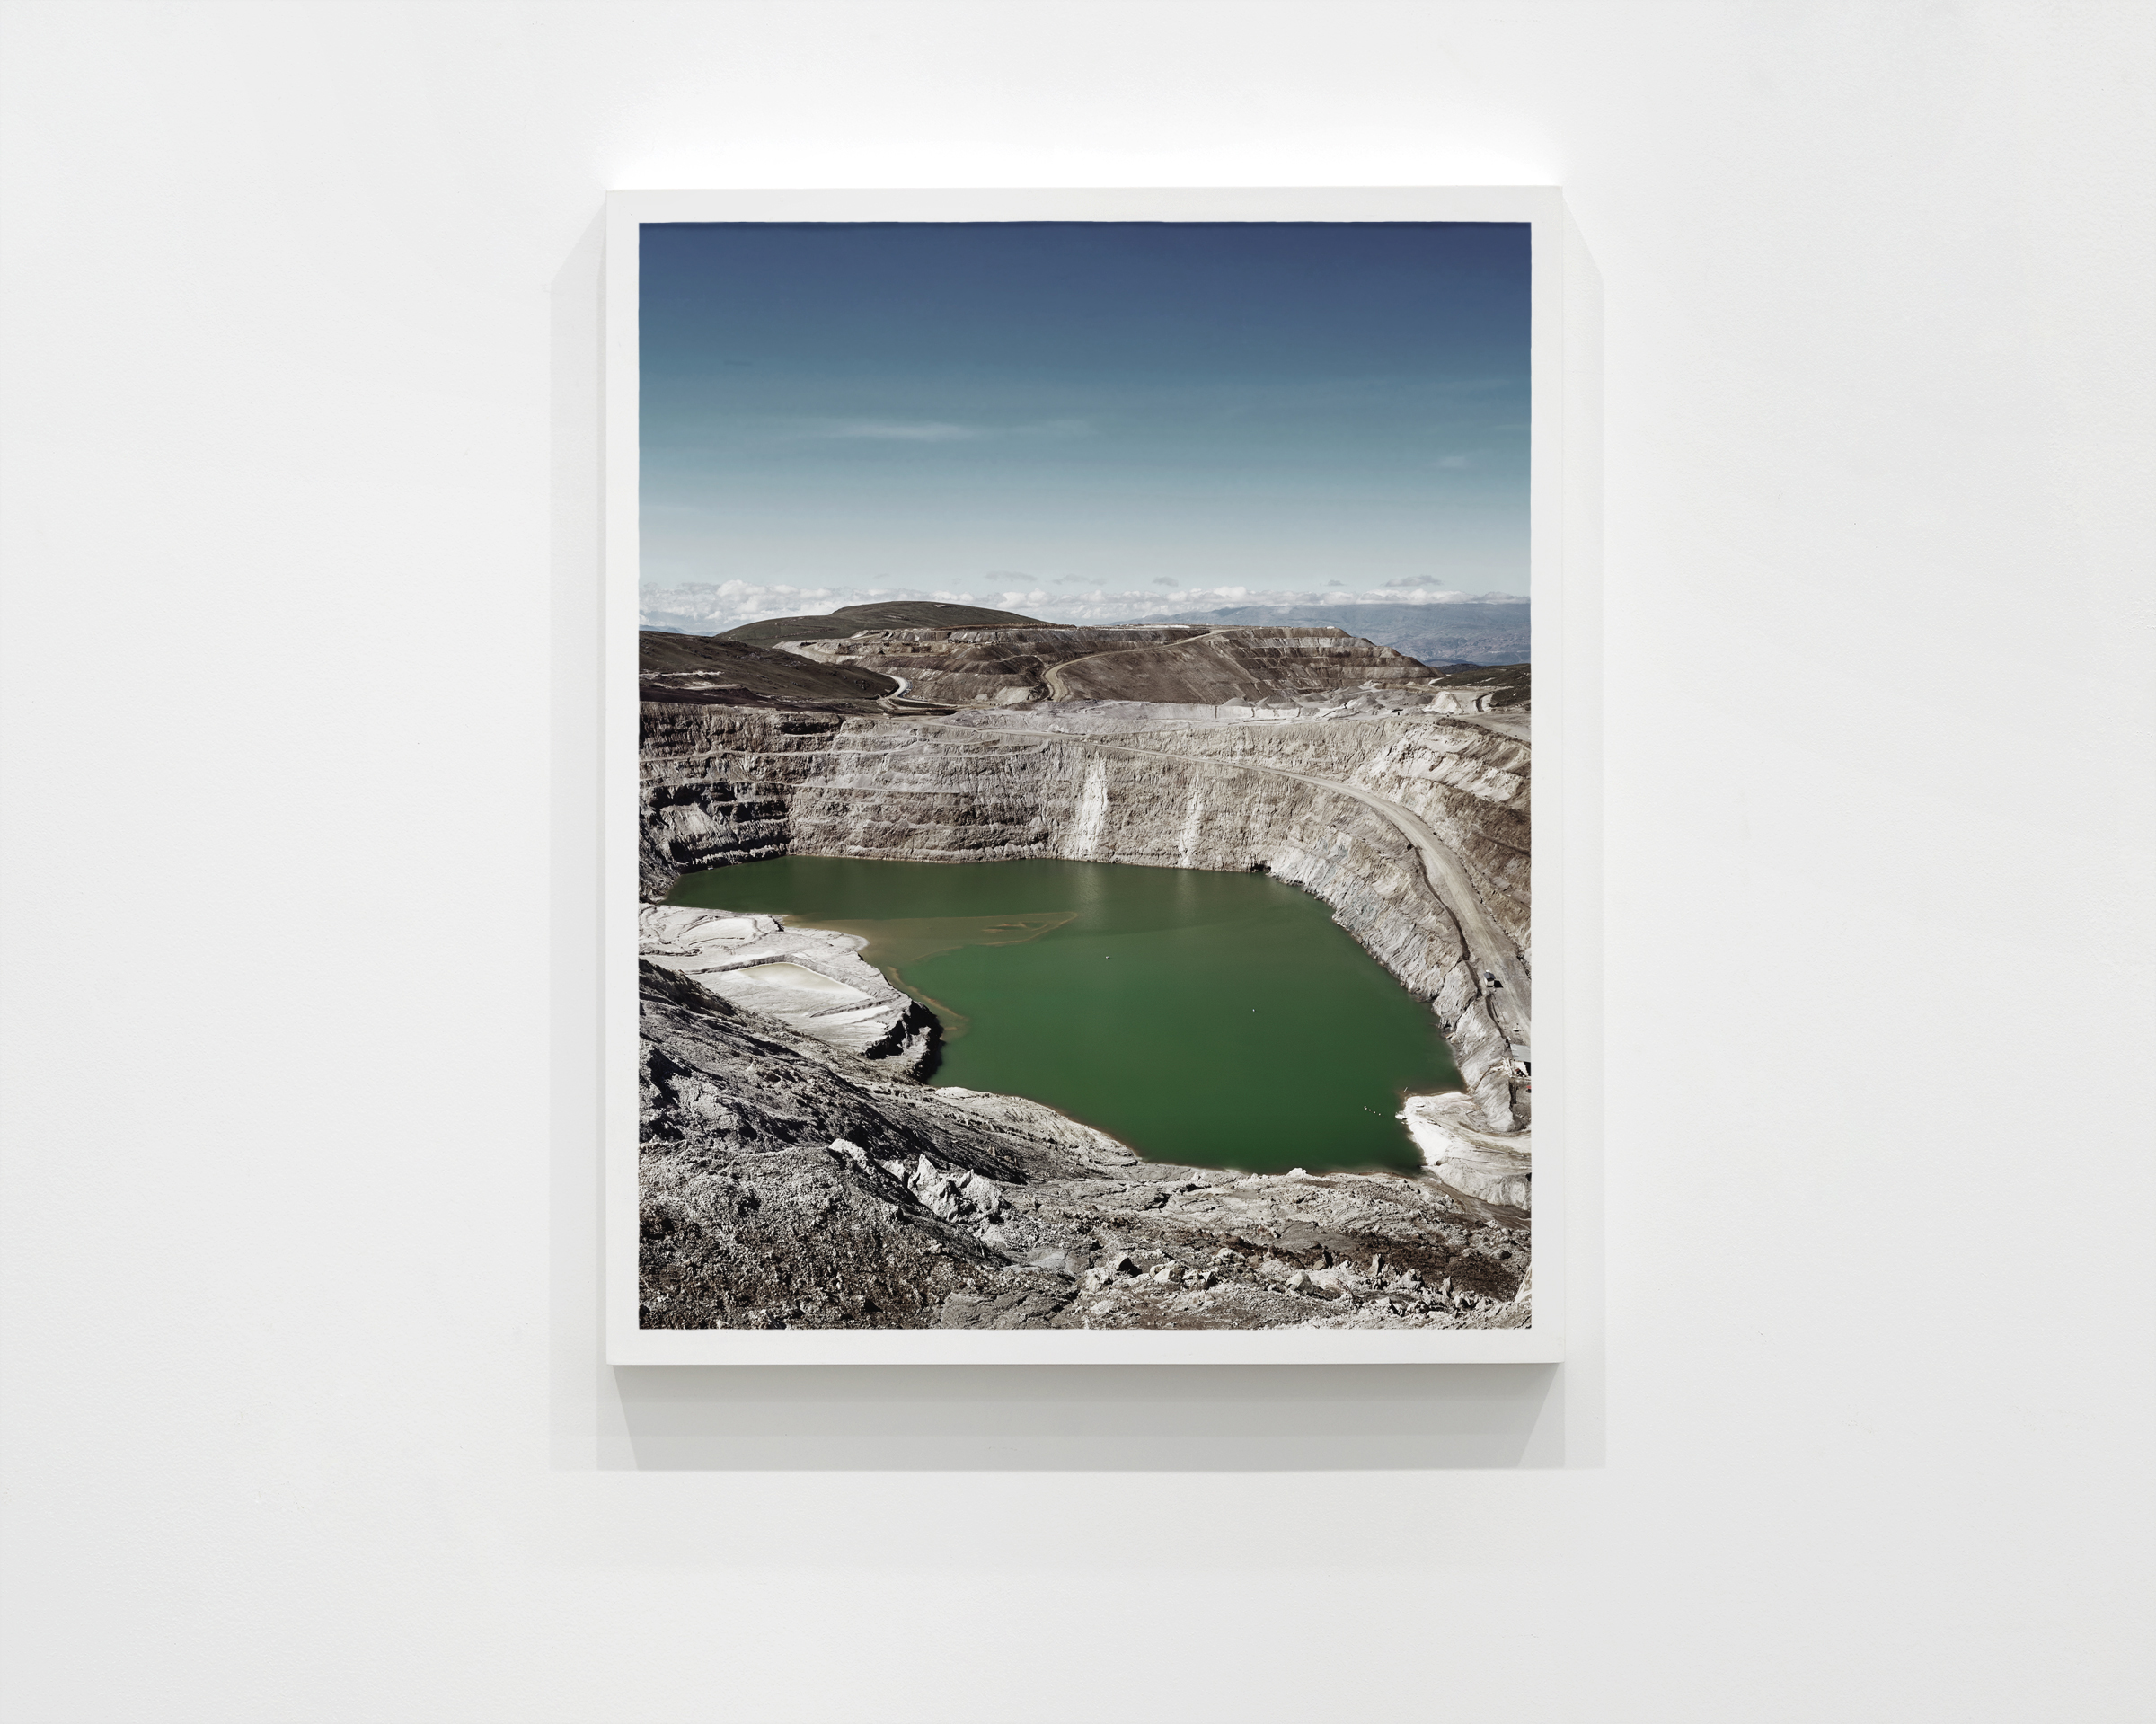 """Maqui Maqui Pit"", 2008  30 x 24 in (76.2 x 60.96 cm)"